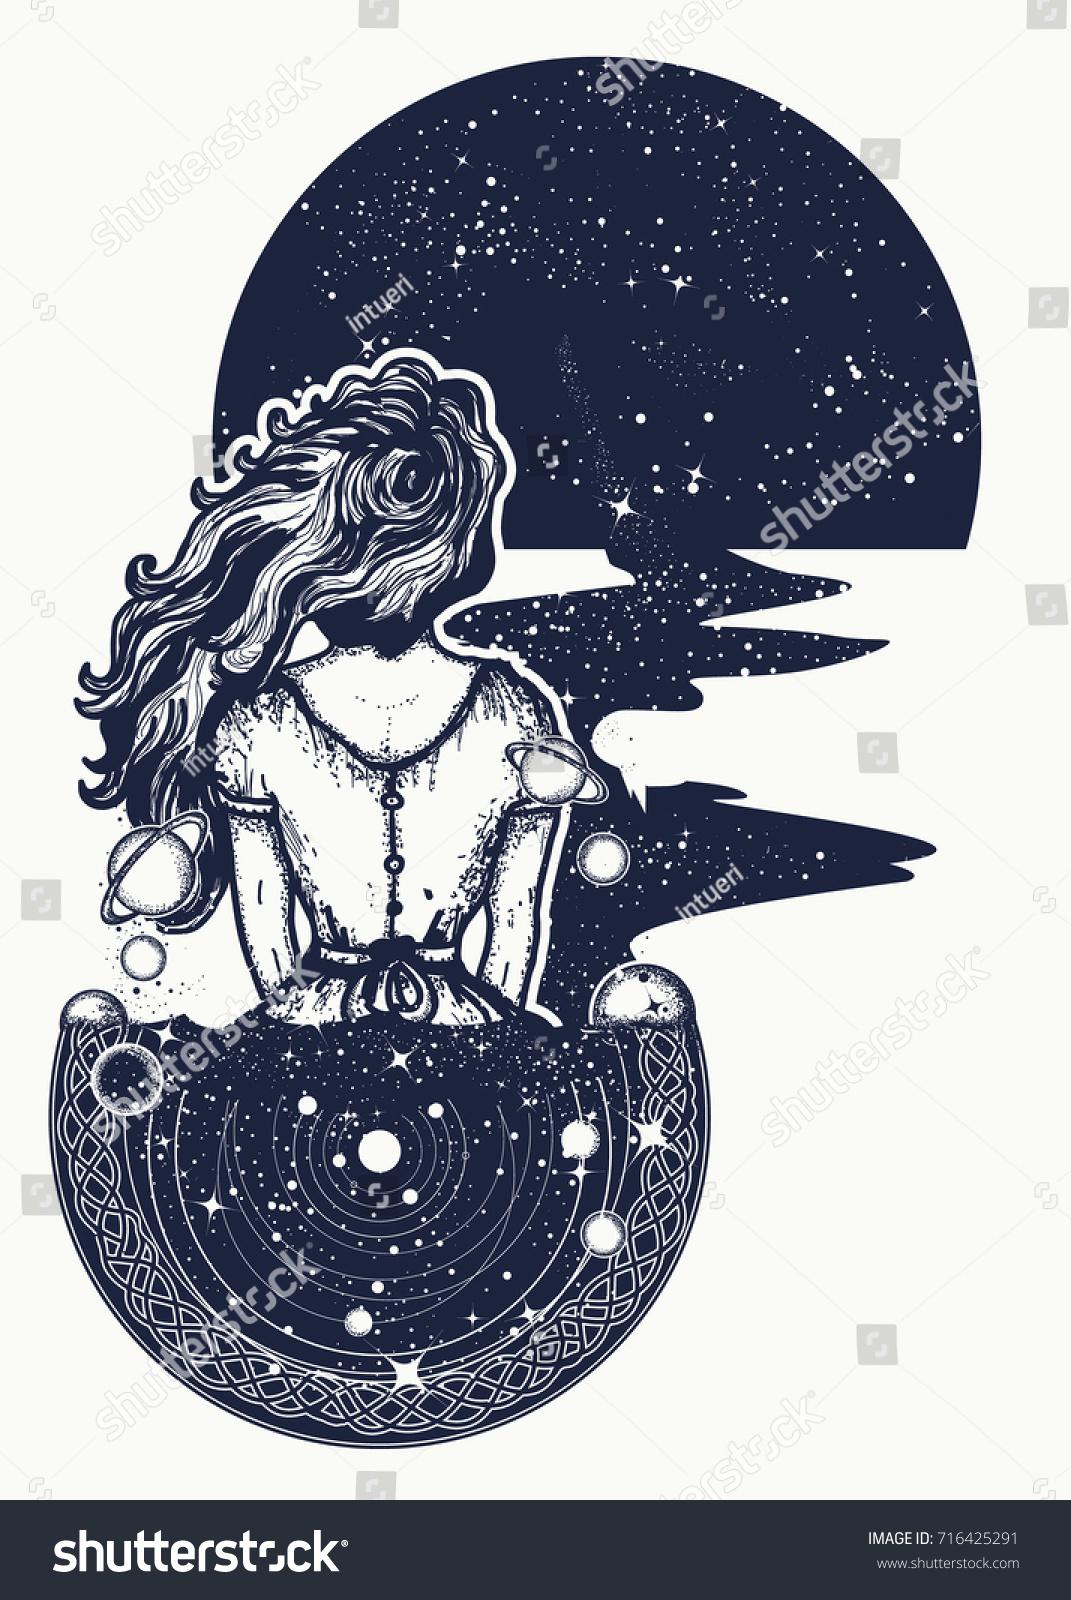 Magic Woman Tattoo Tshirt Design Surreal Stock Vector 716425291